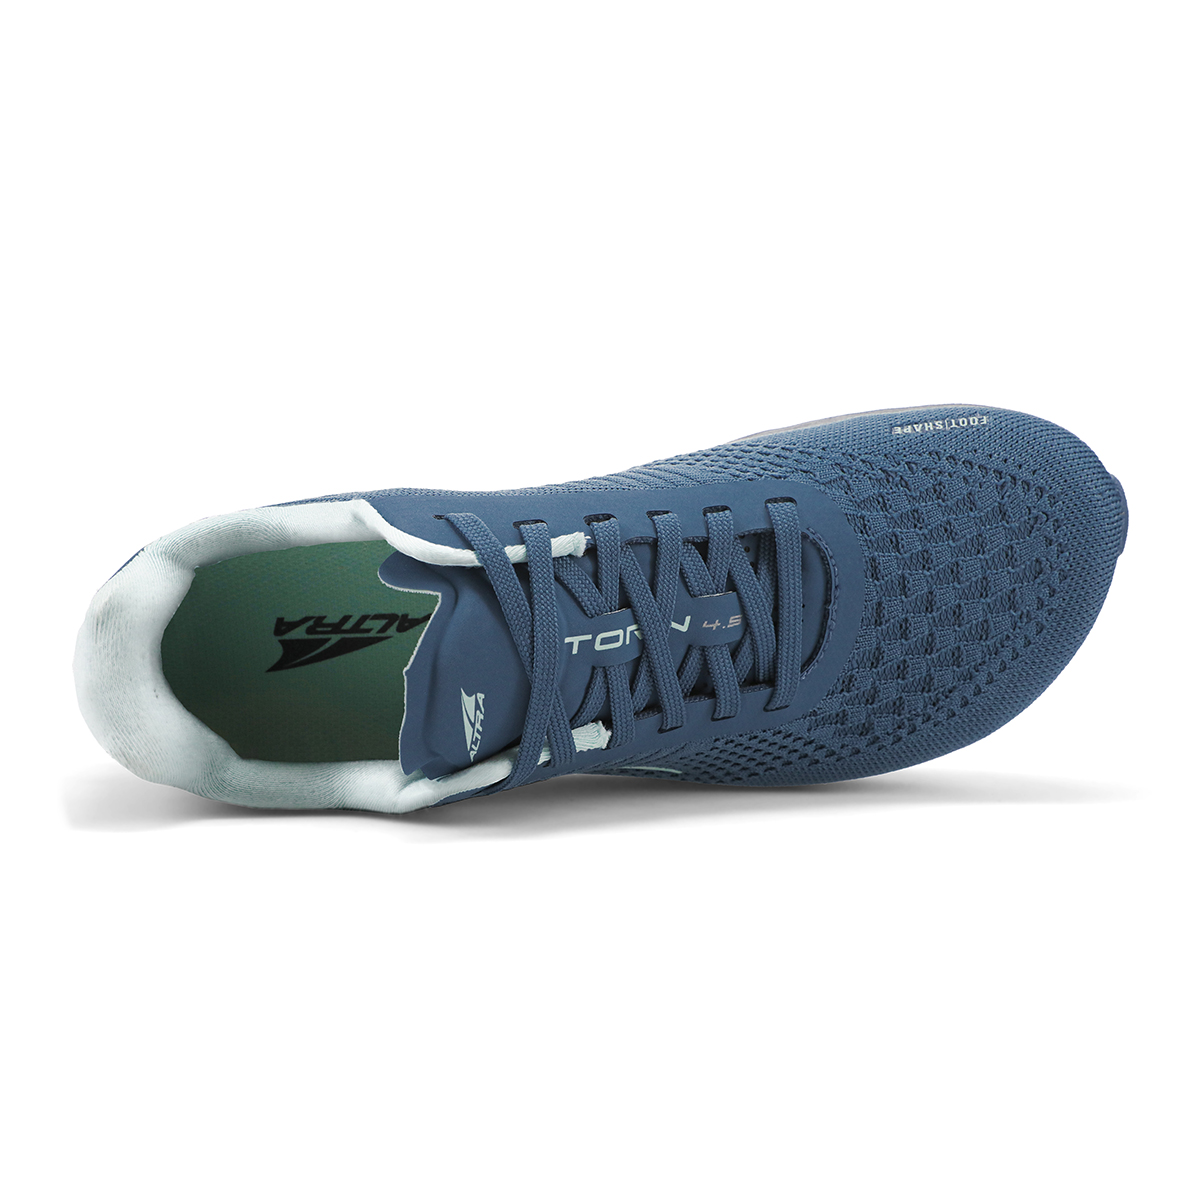 Women's Altra Torin 4.5 Plush Running Shoe - Color: Blue - Size: 7 - Width: Regular, Blue, large, image 2